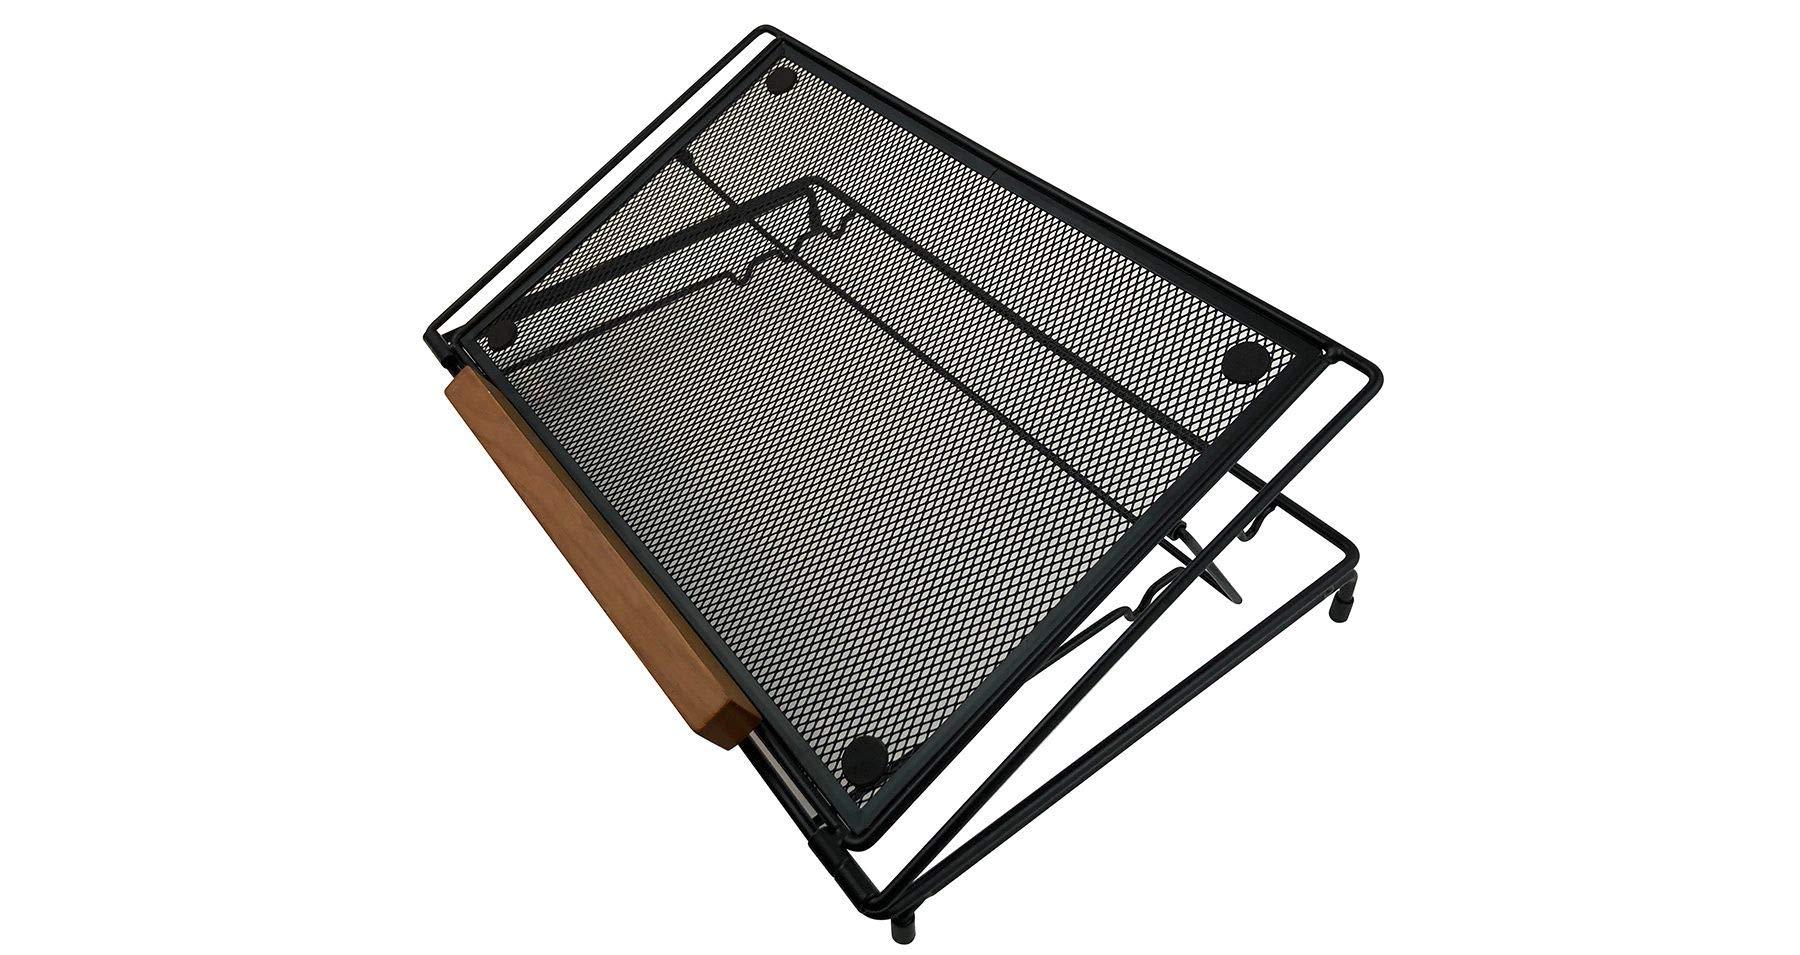 Posidesk POSI211LPBK Adjustable Folding Laptop Stand 3 Angle Positions Mesh Back Heat Ventilation